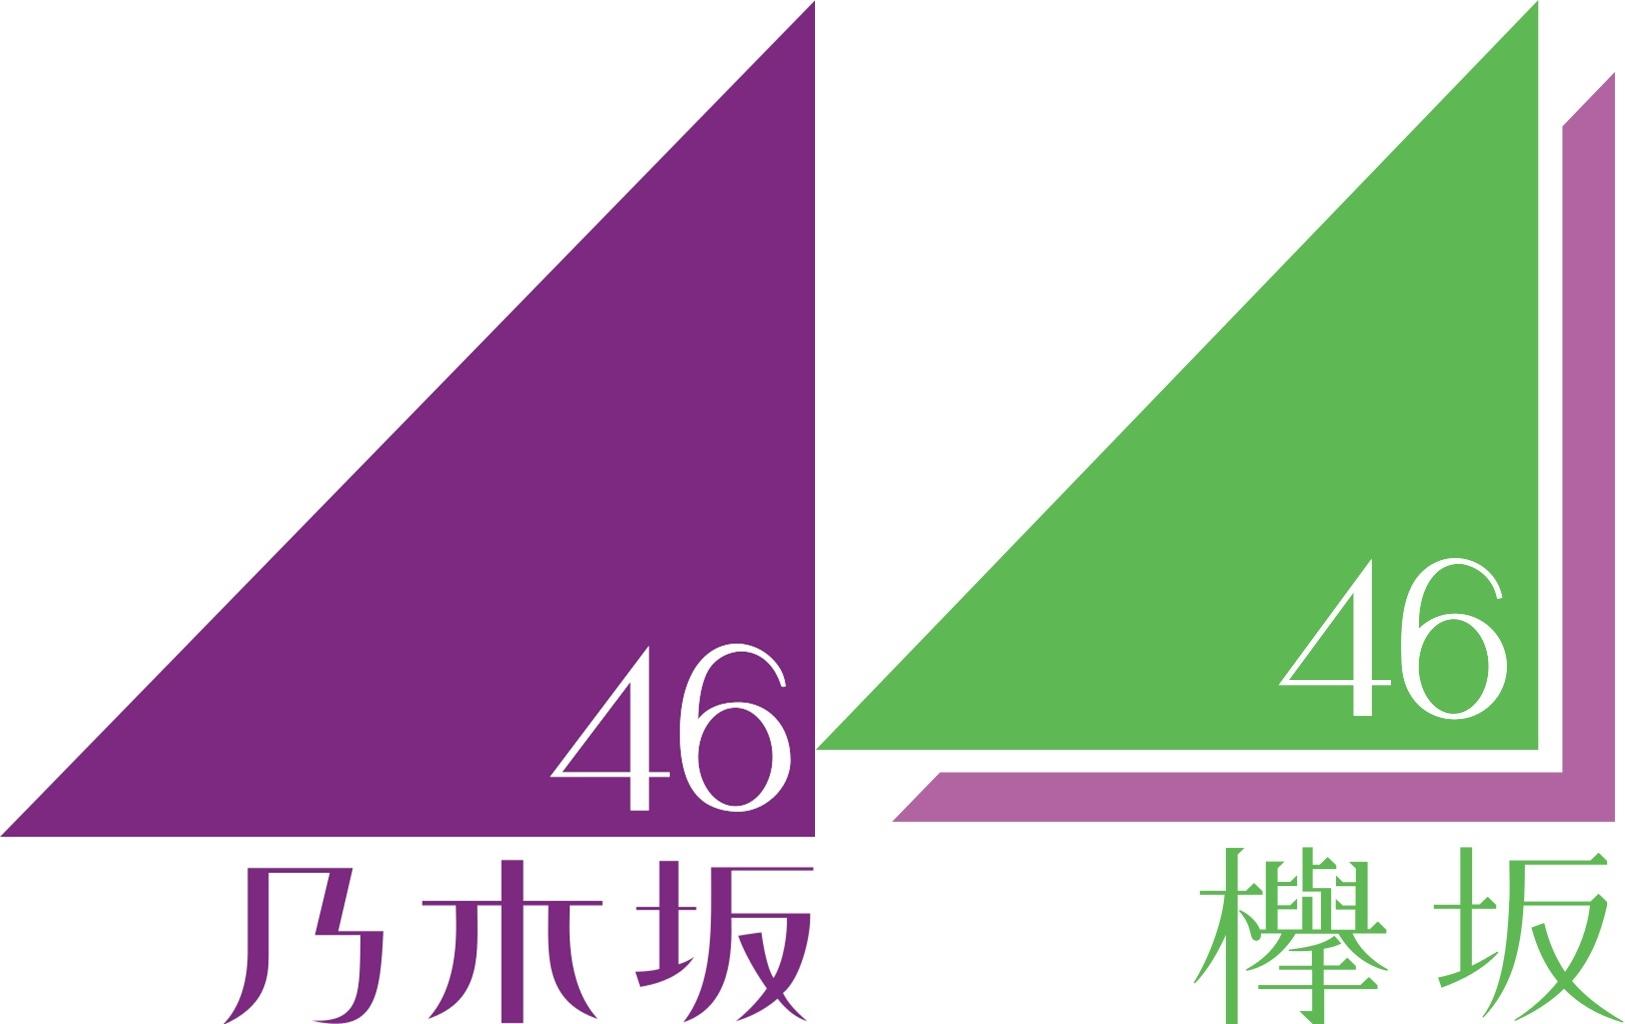 乃木坂46&欅坂46が紅白出場決定!!